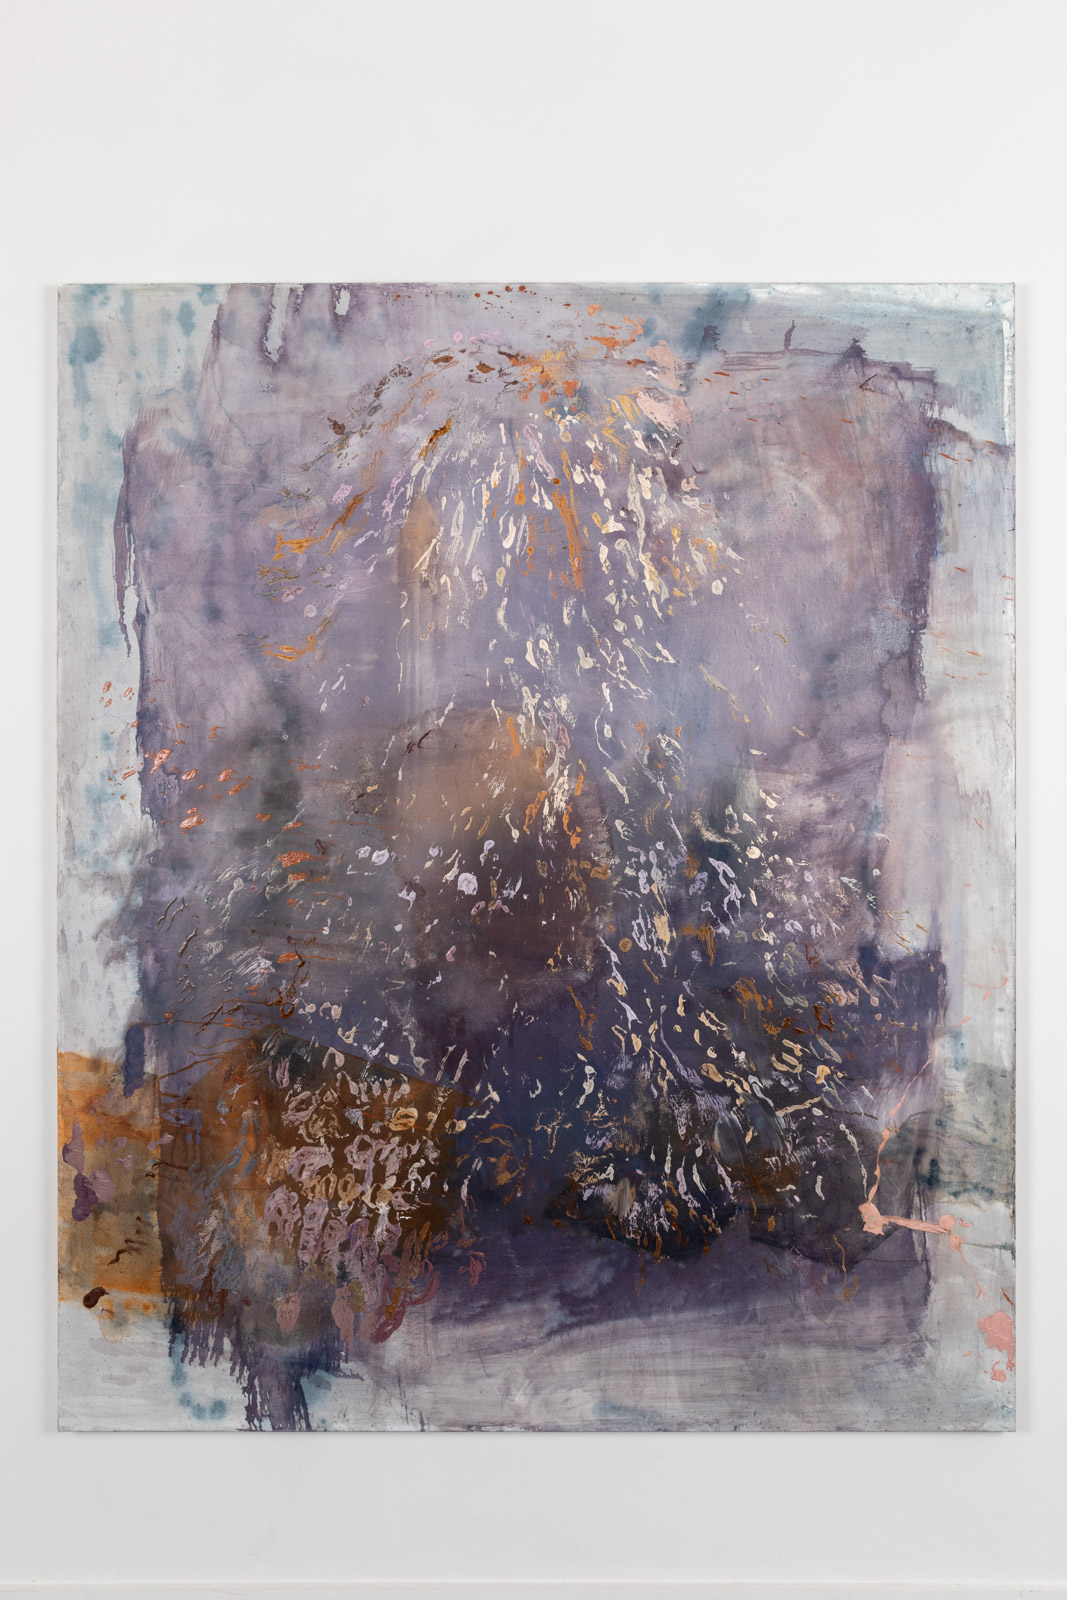 Ra Noor, 2020, Oil on canvas, 182,8 x 152,4 cm